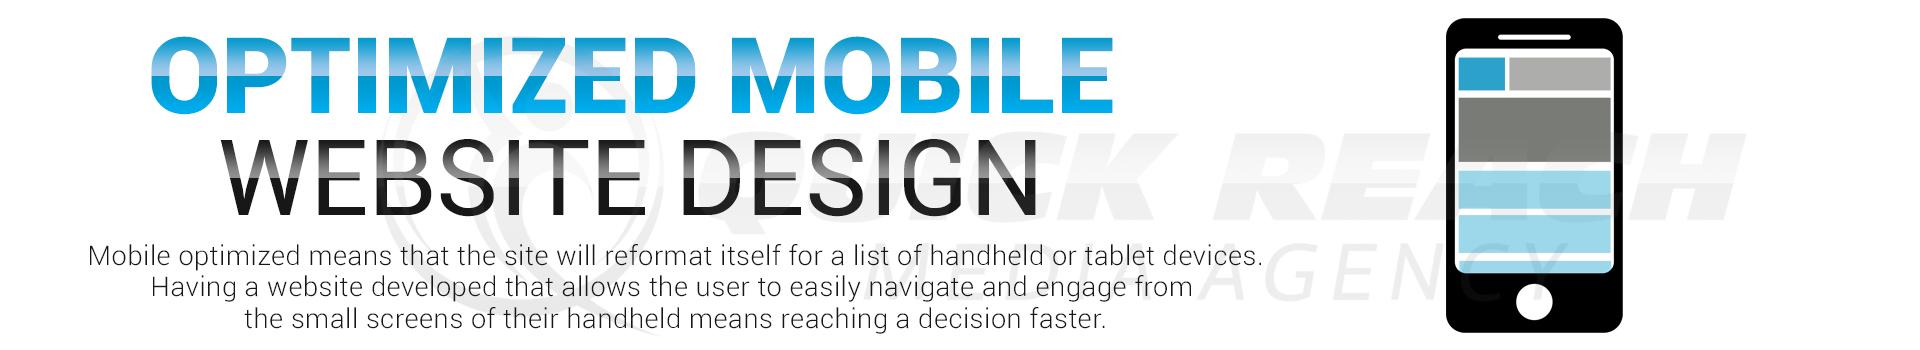 Optimized Mobile Websites